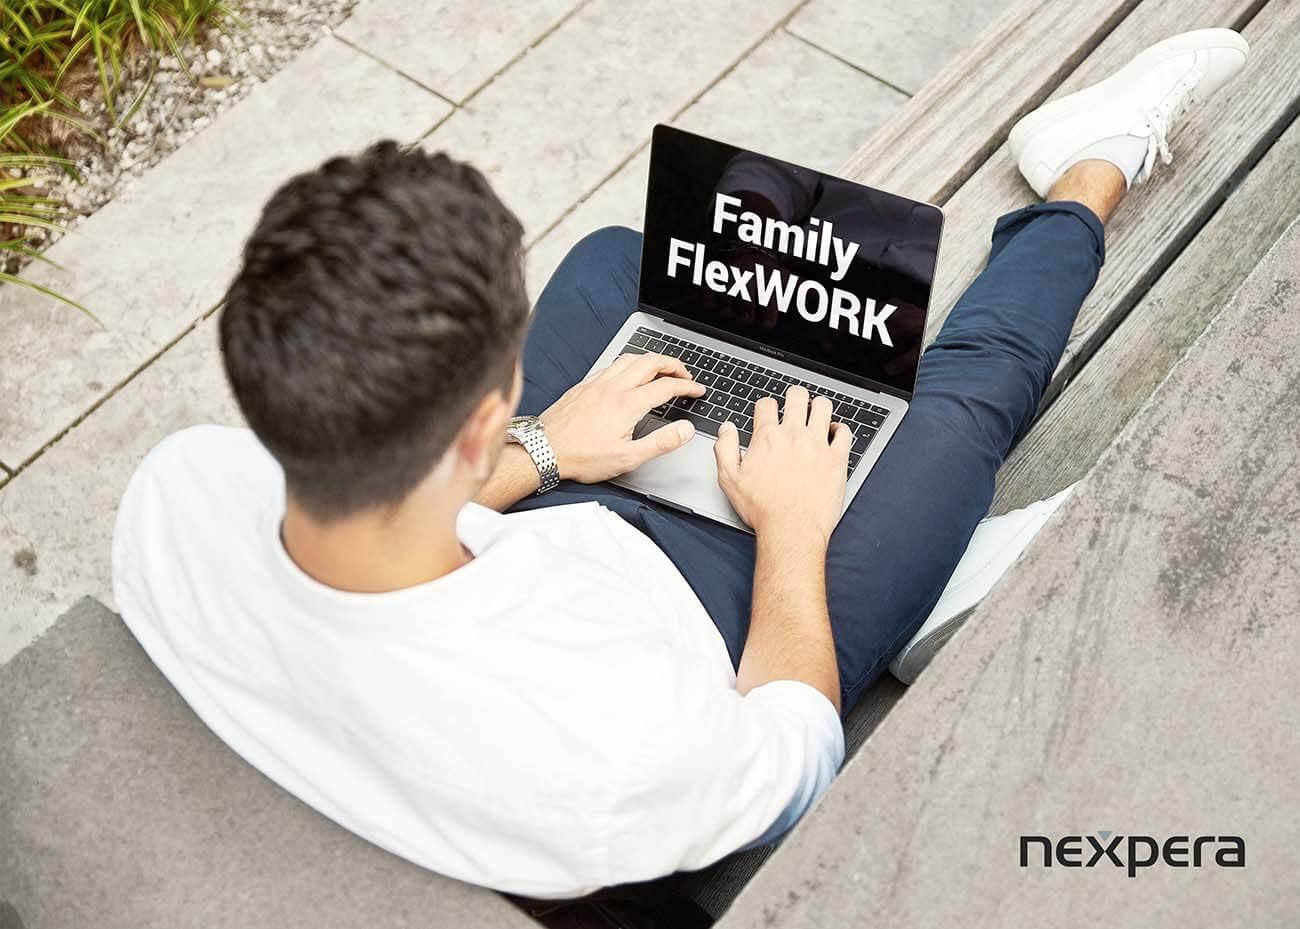 nexpera family flexwork